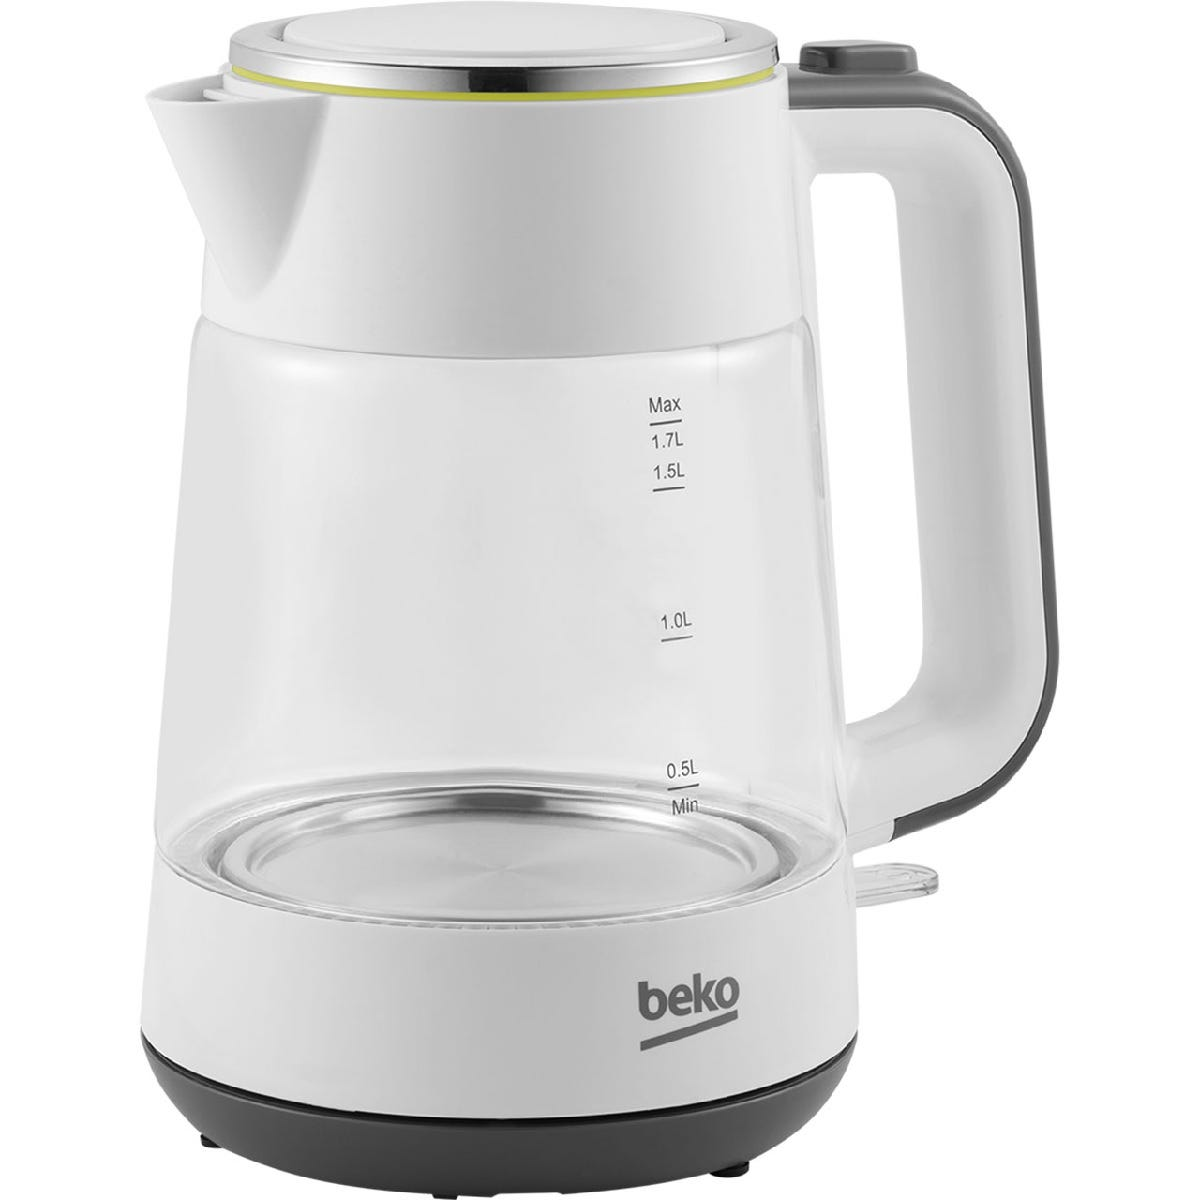 Image of Beko New Line 1.7L Glass Kettle - White